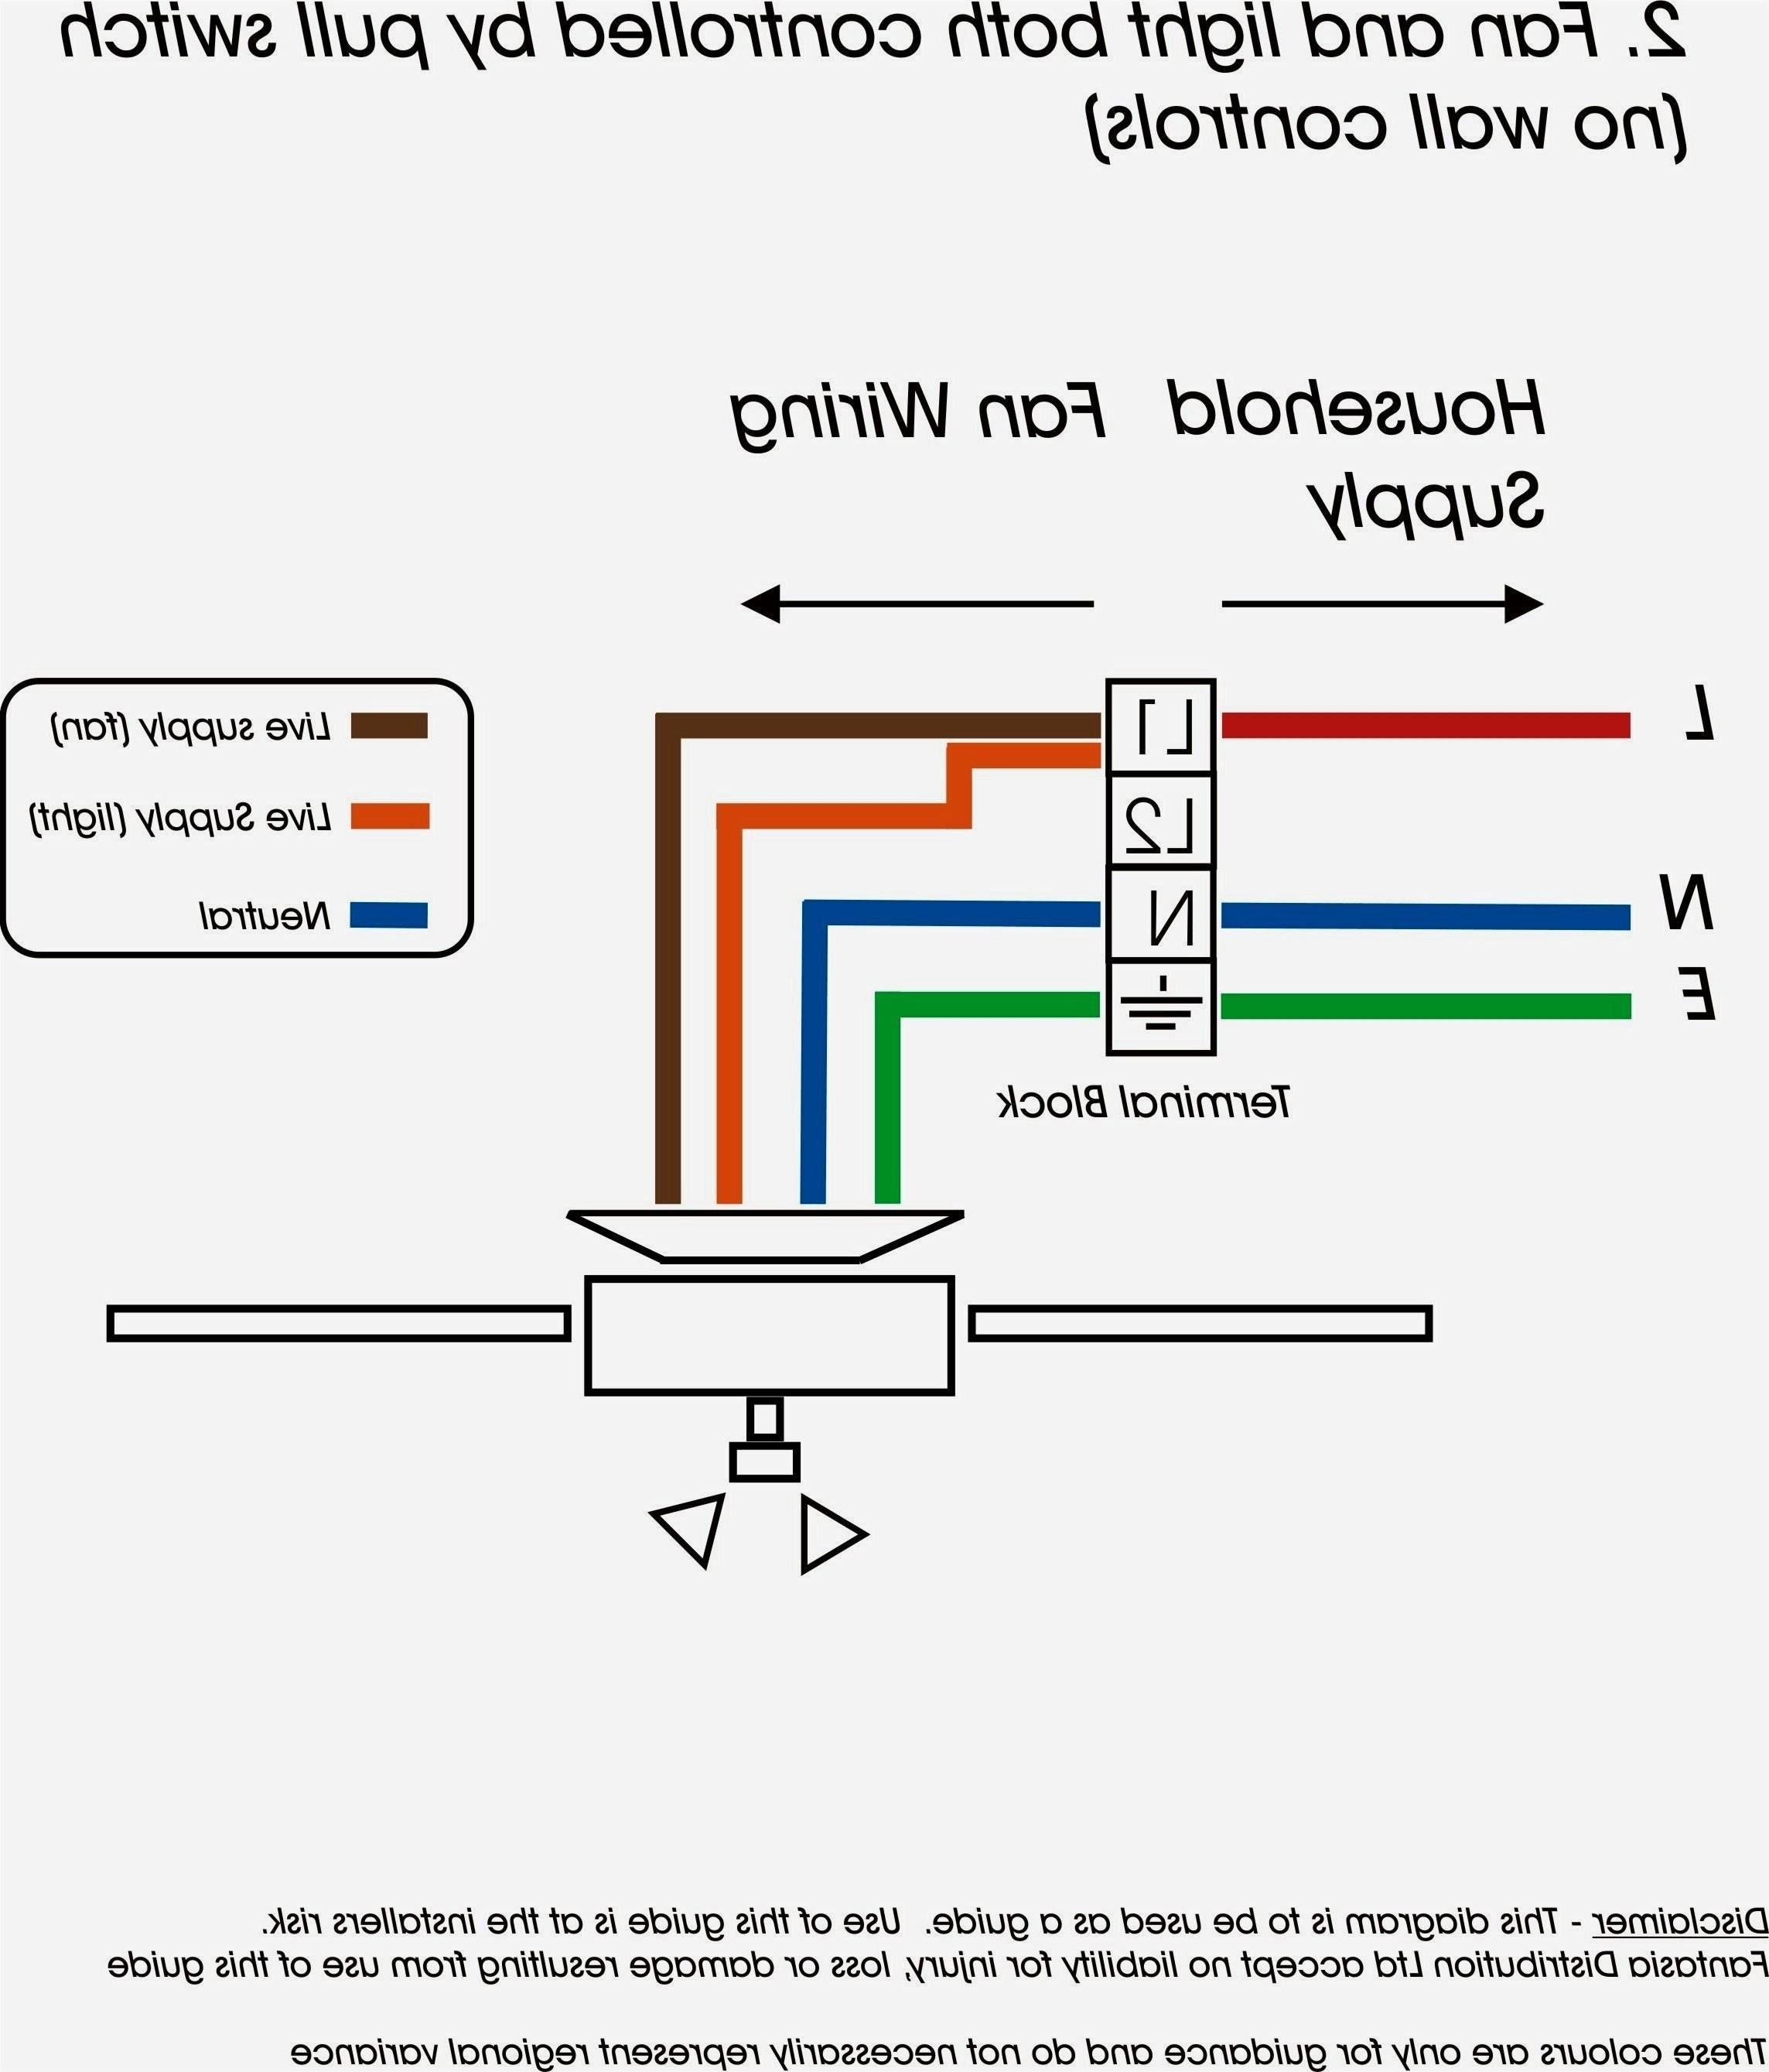 Boat Trailer Wiring Diagram 4 Way Curt 4 Way Trailer Plug Wiring Diagram Schematic Diagrams Of Boat Trailer Wiring Diagram 4 Way